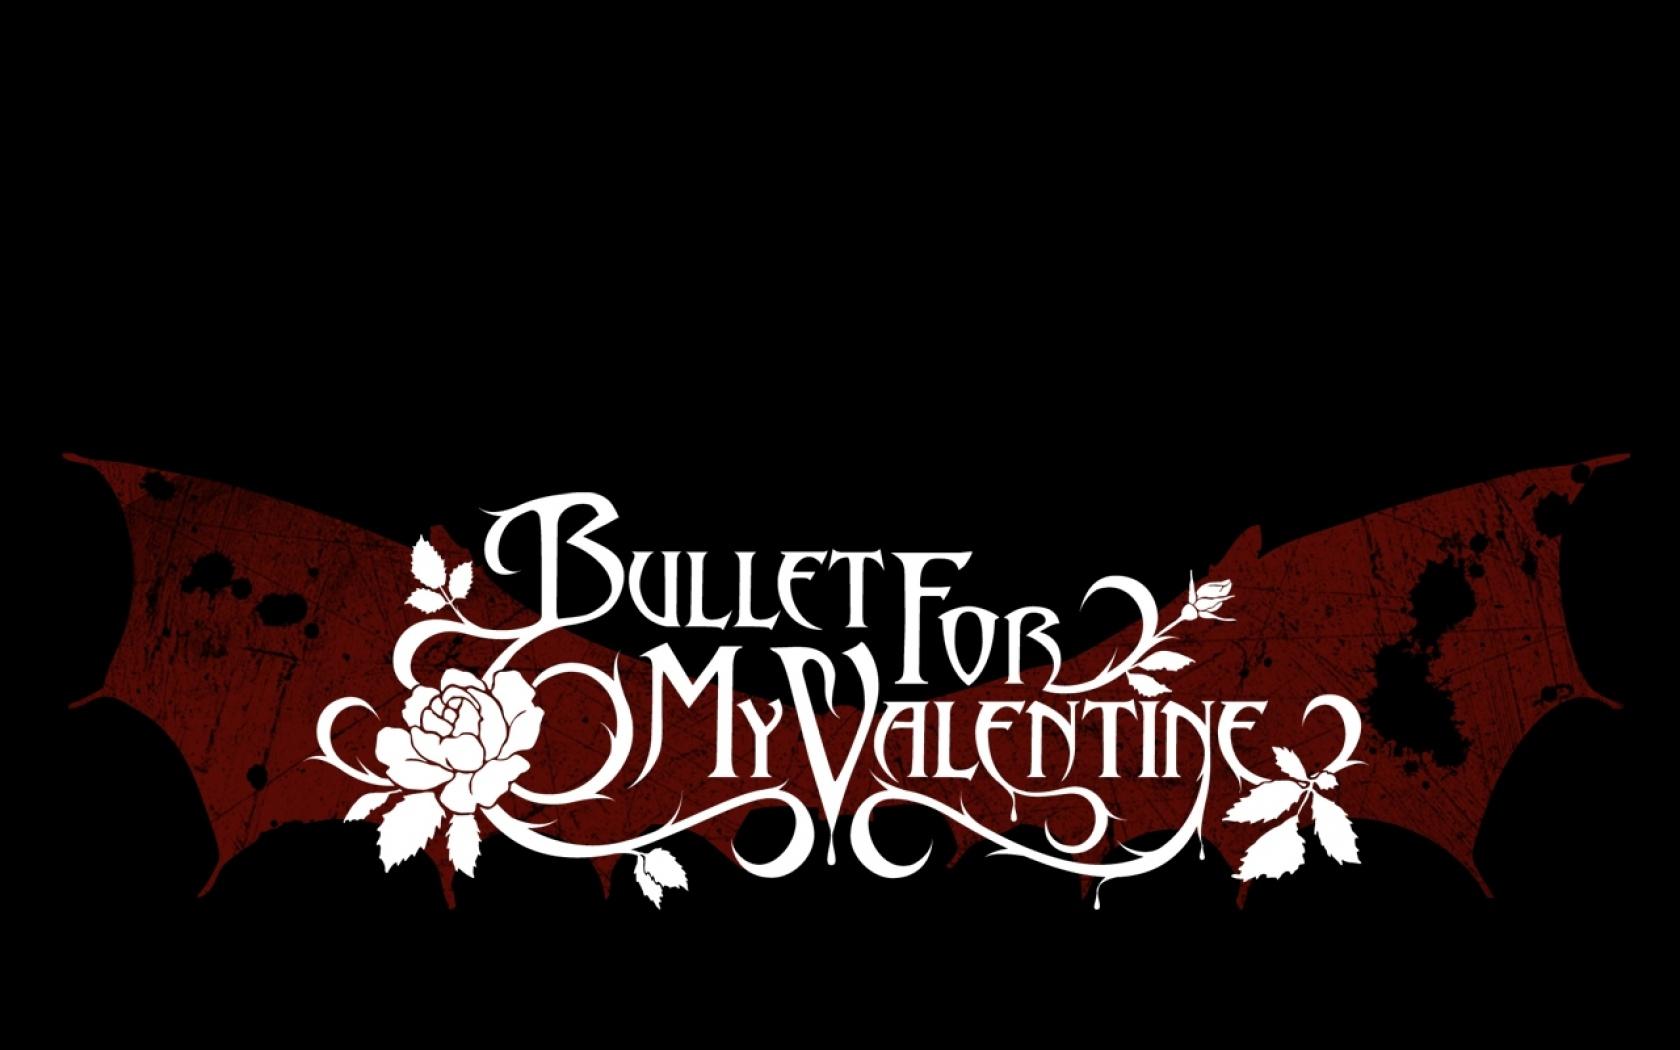 Bullet for my valentine album 1680 x 1050 download close